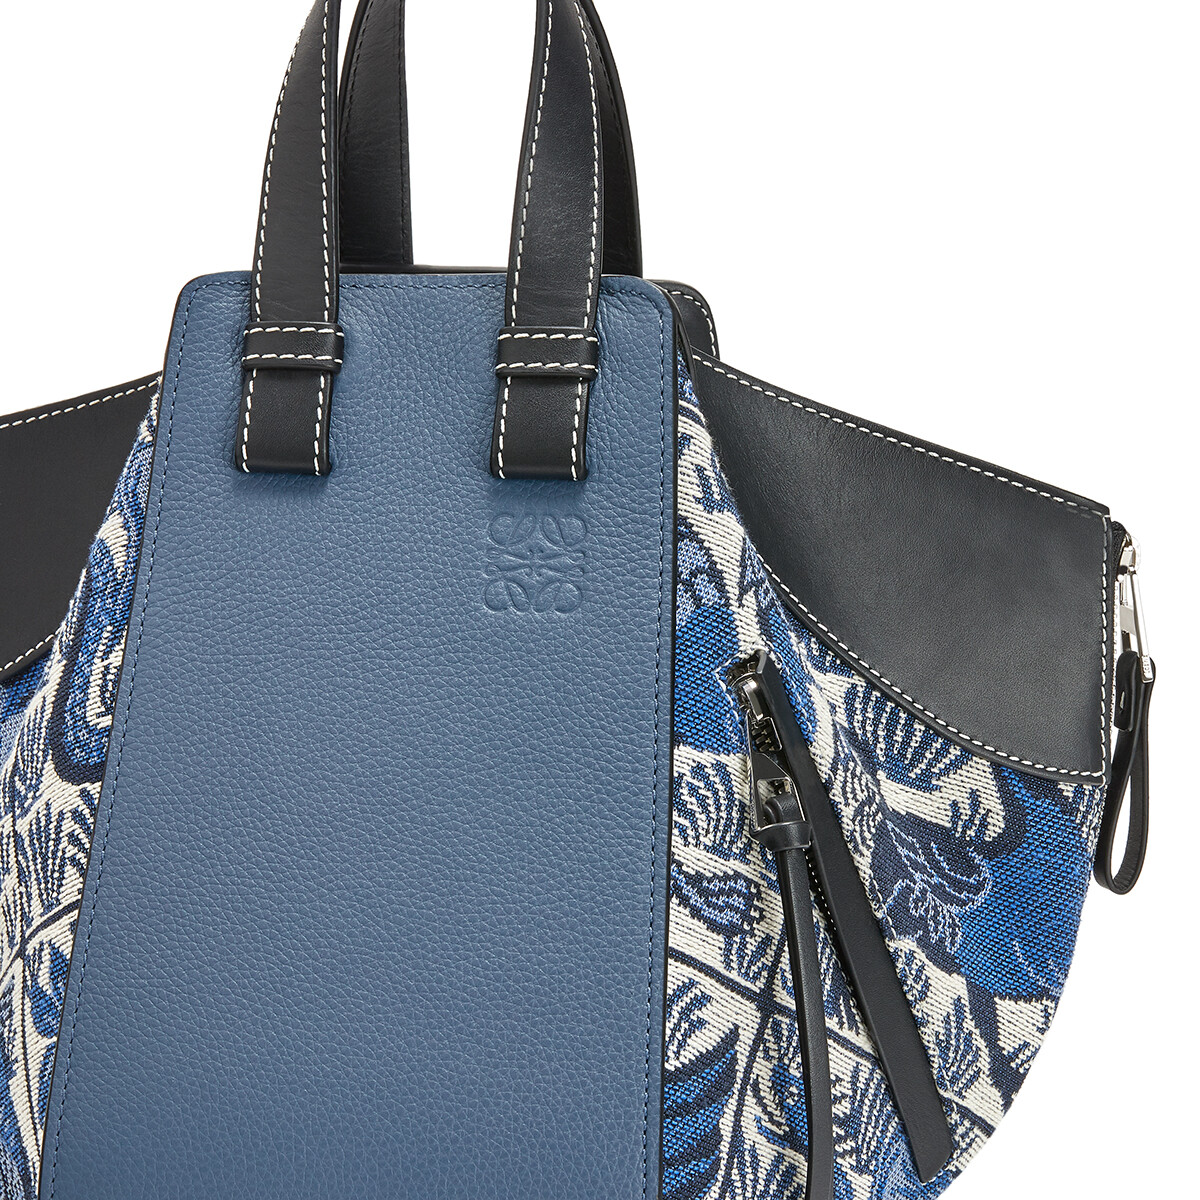 Hammock Tiles Small Bag